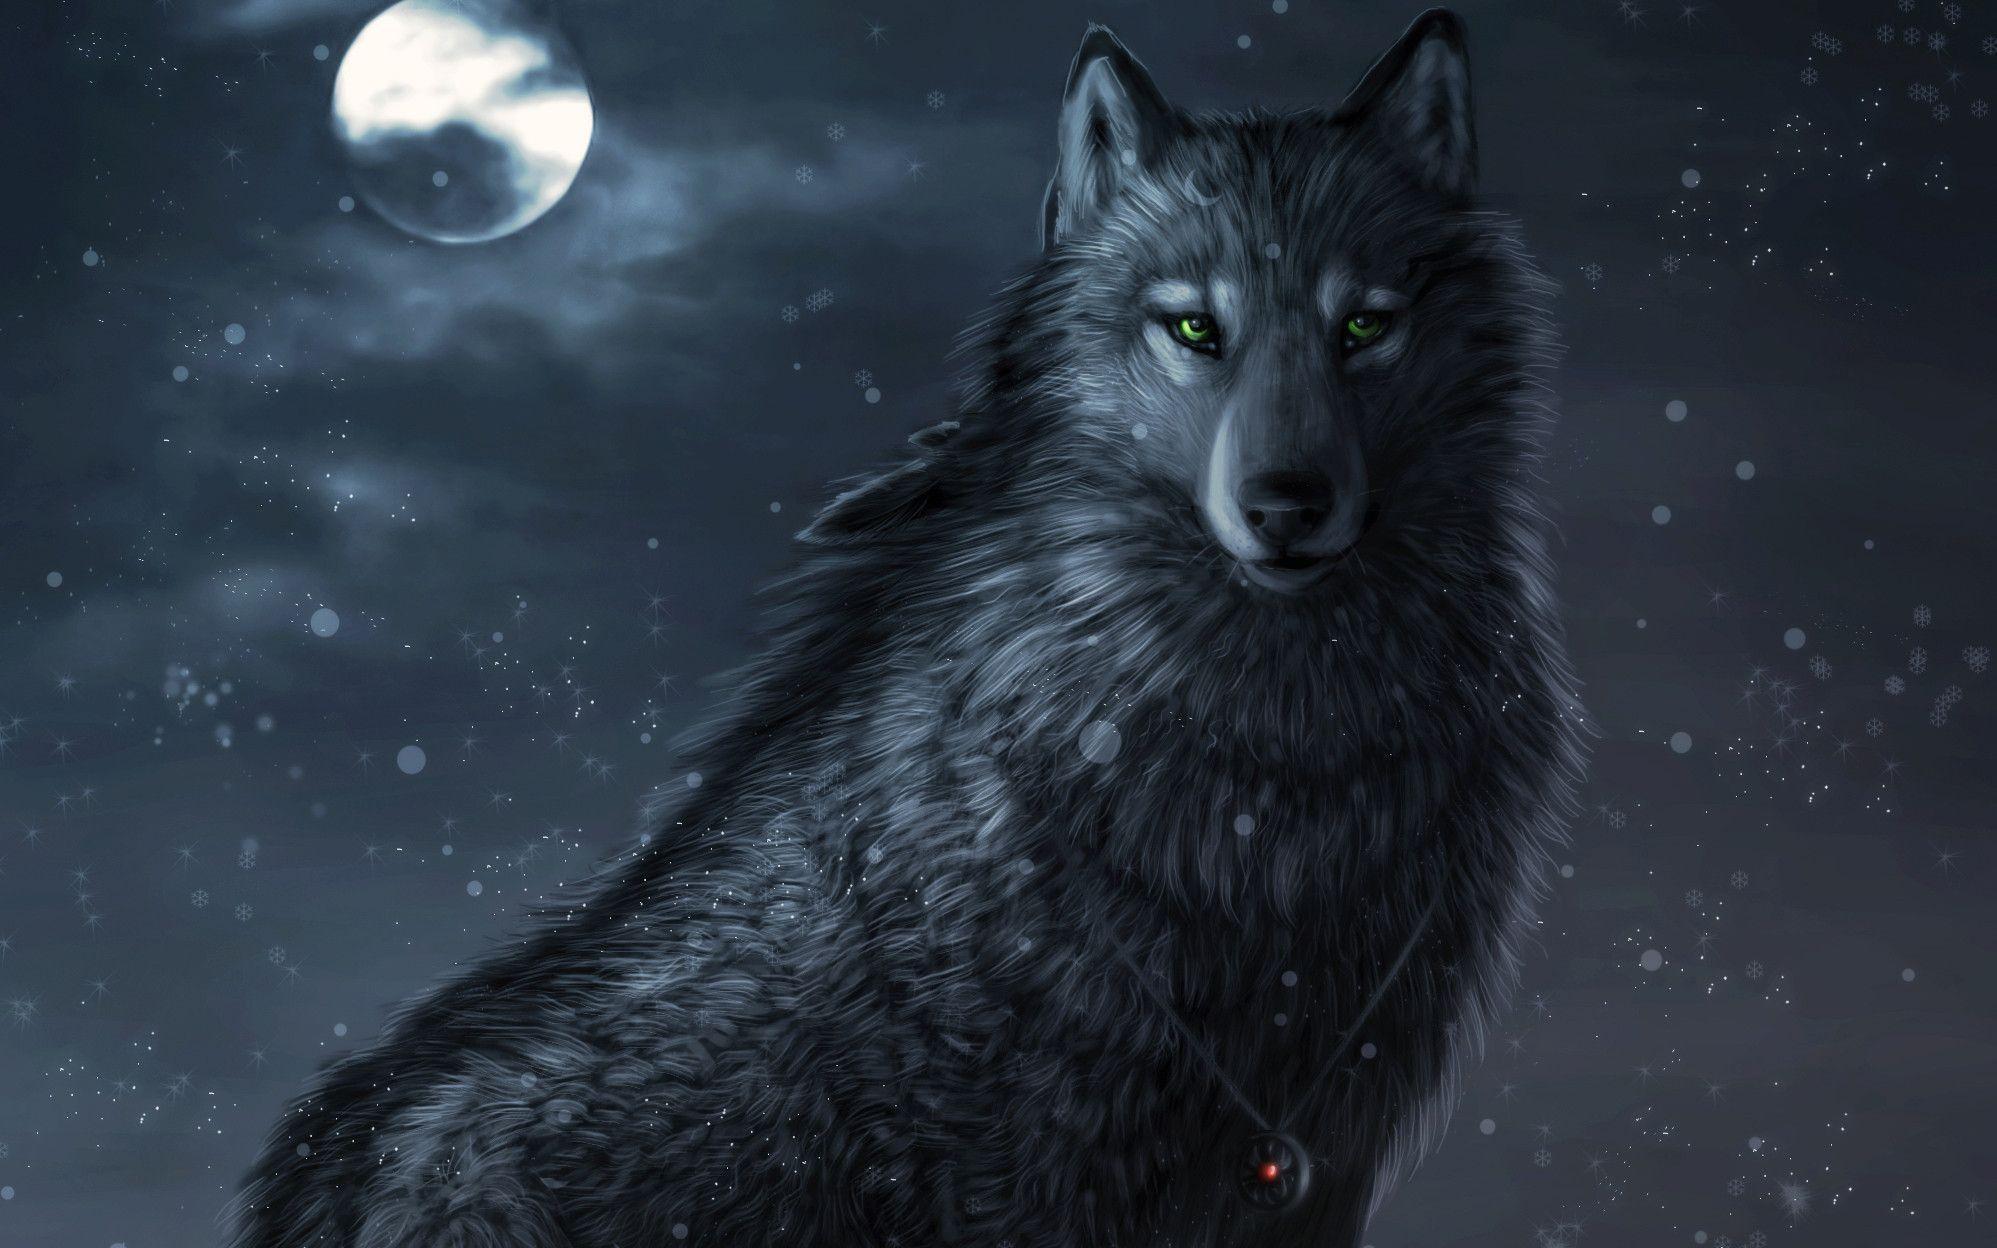 Wolf Computer Wallpapers Desktop Backgrounds x ID